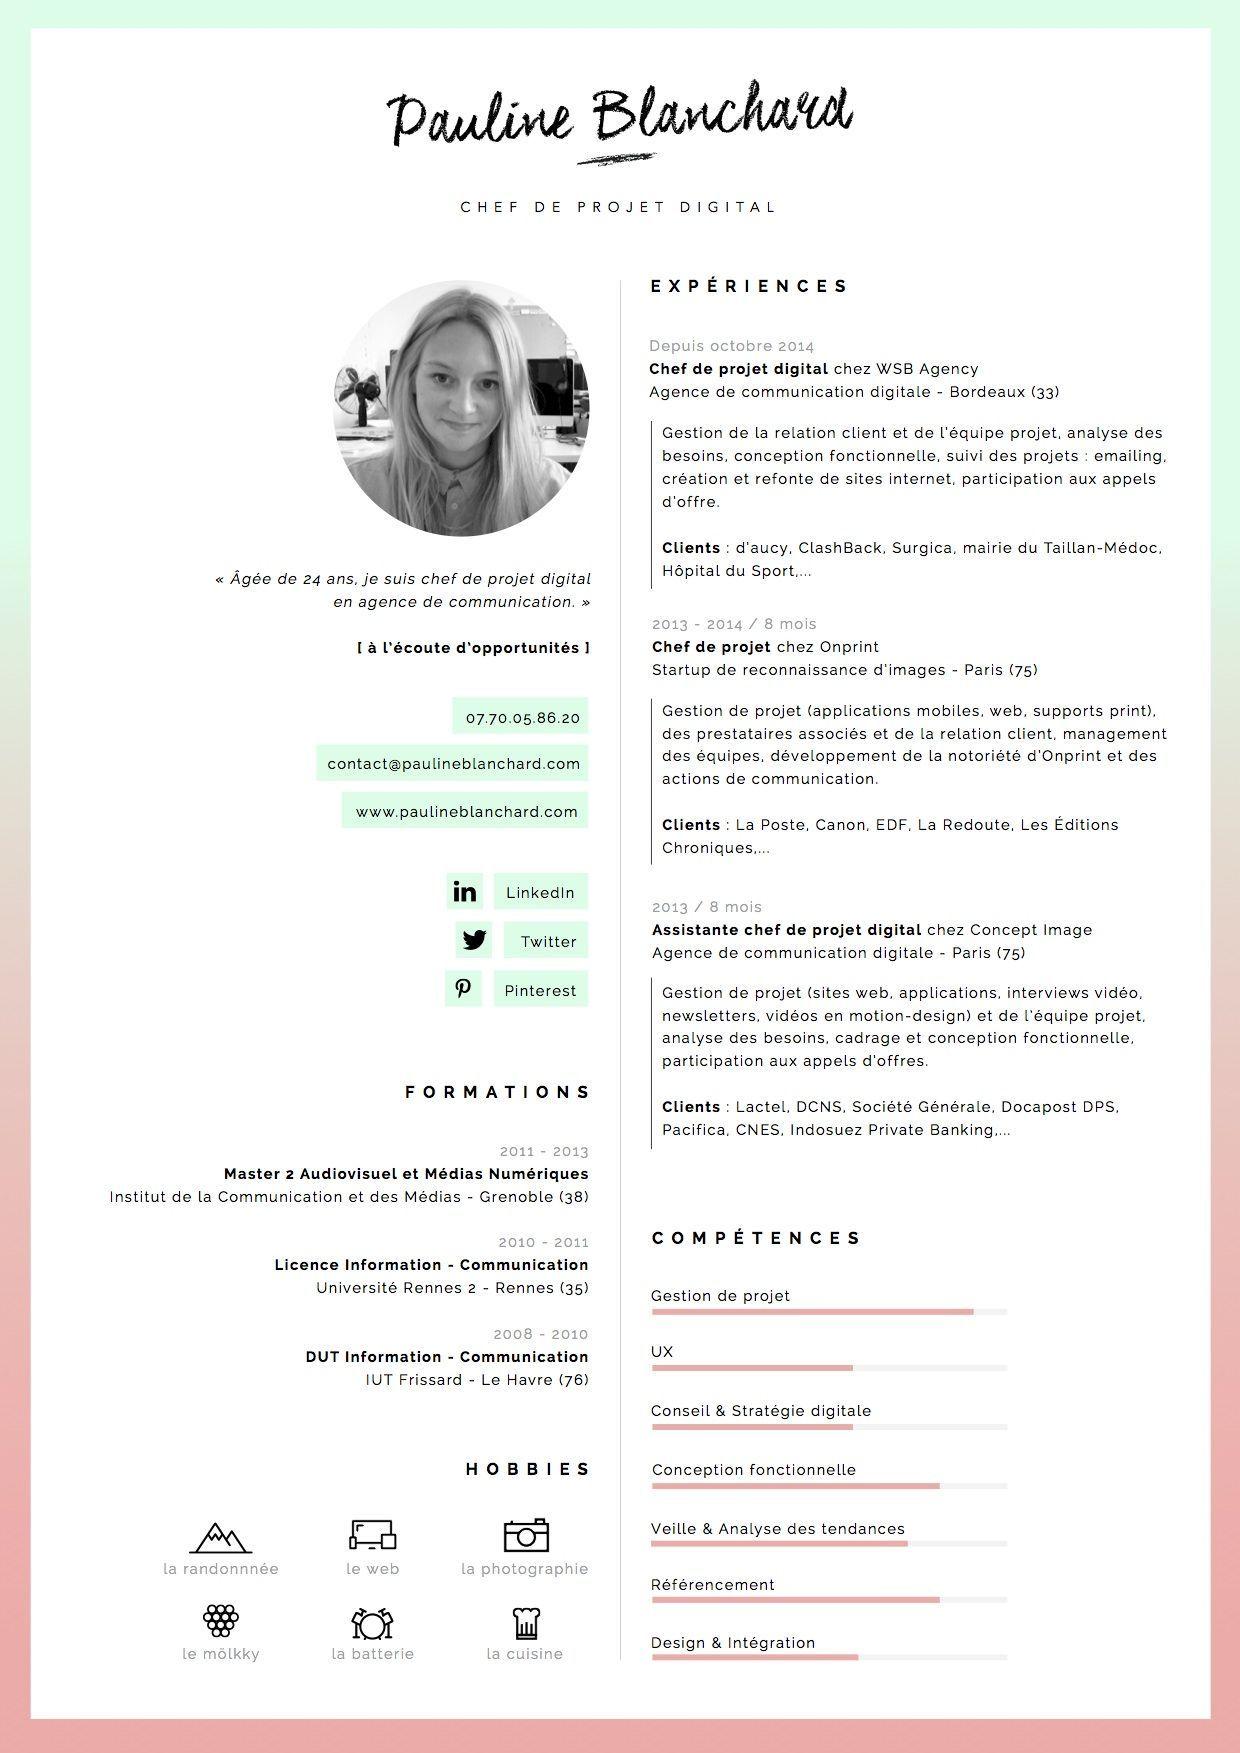 cv pauline blanchard  chef de projet digital  u00e0 bordeaux